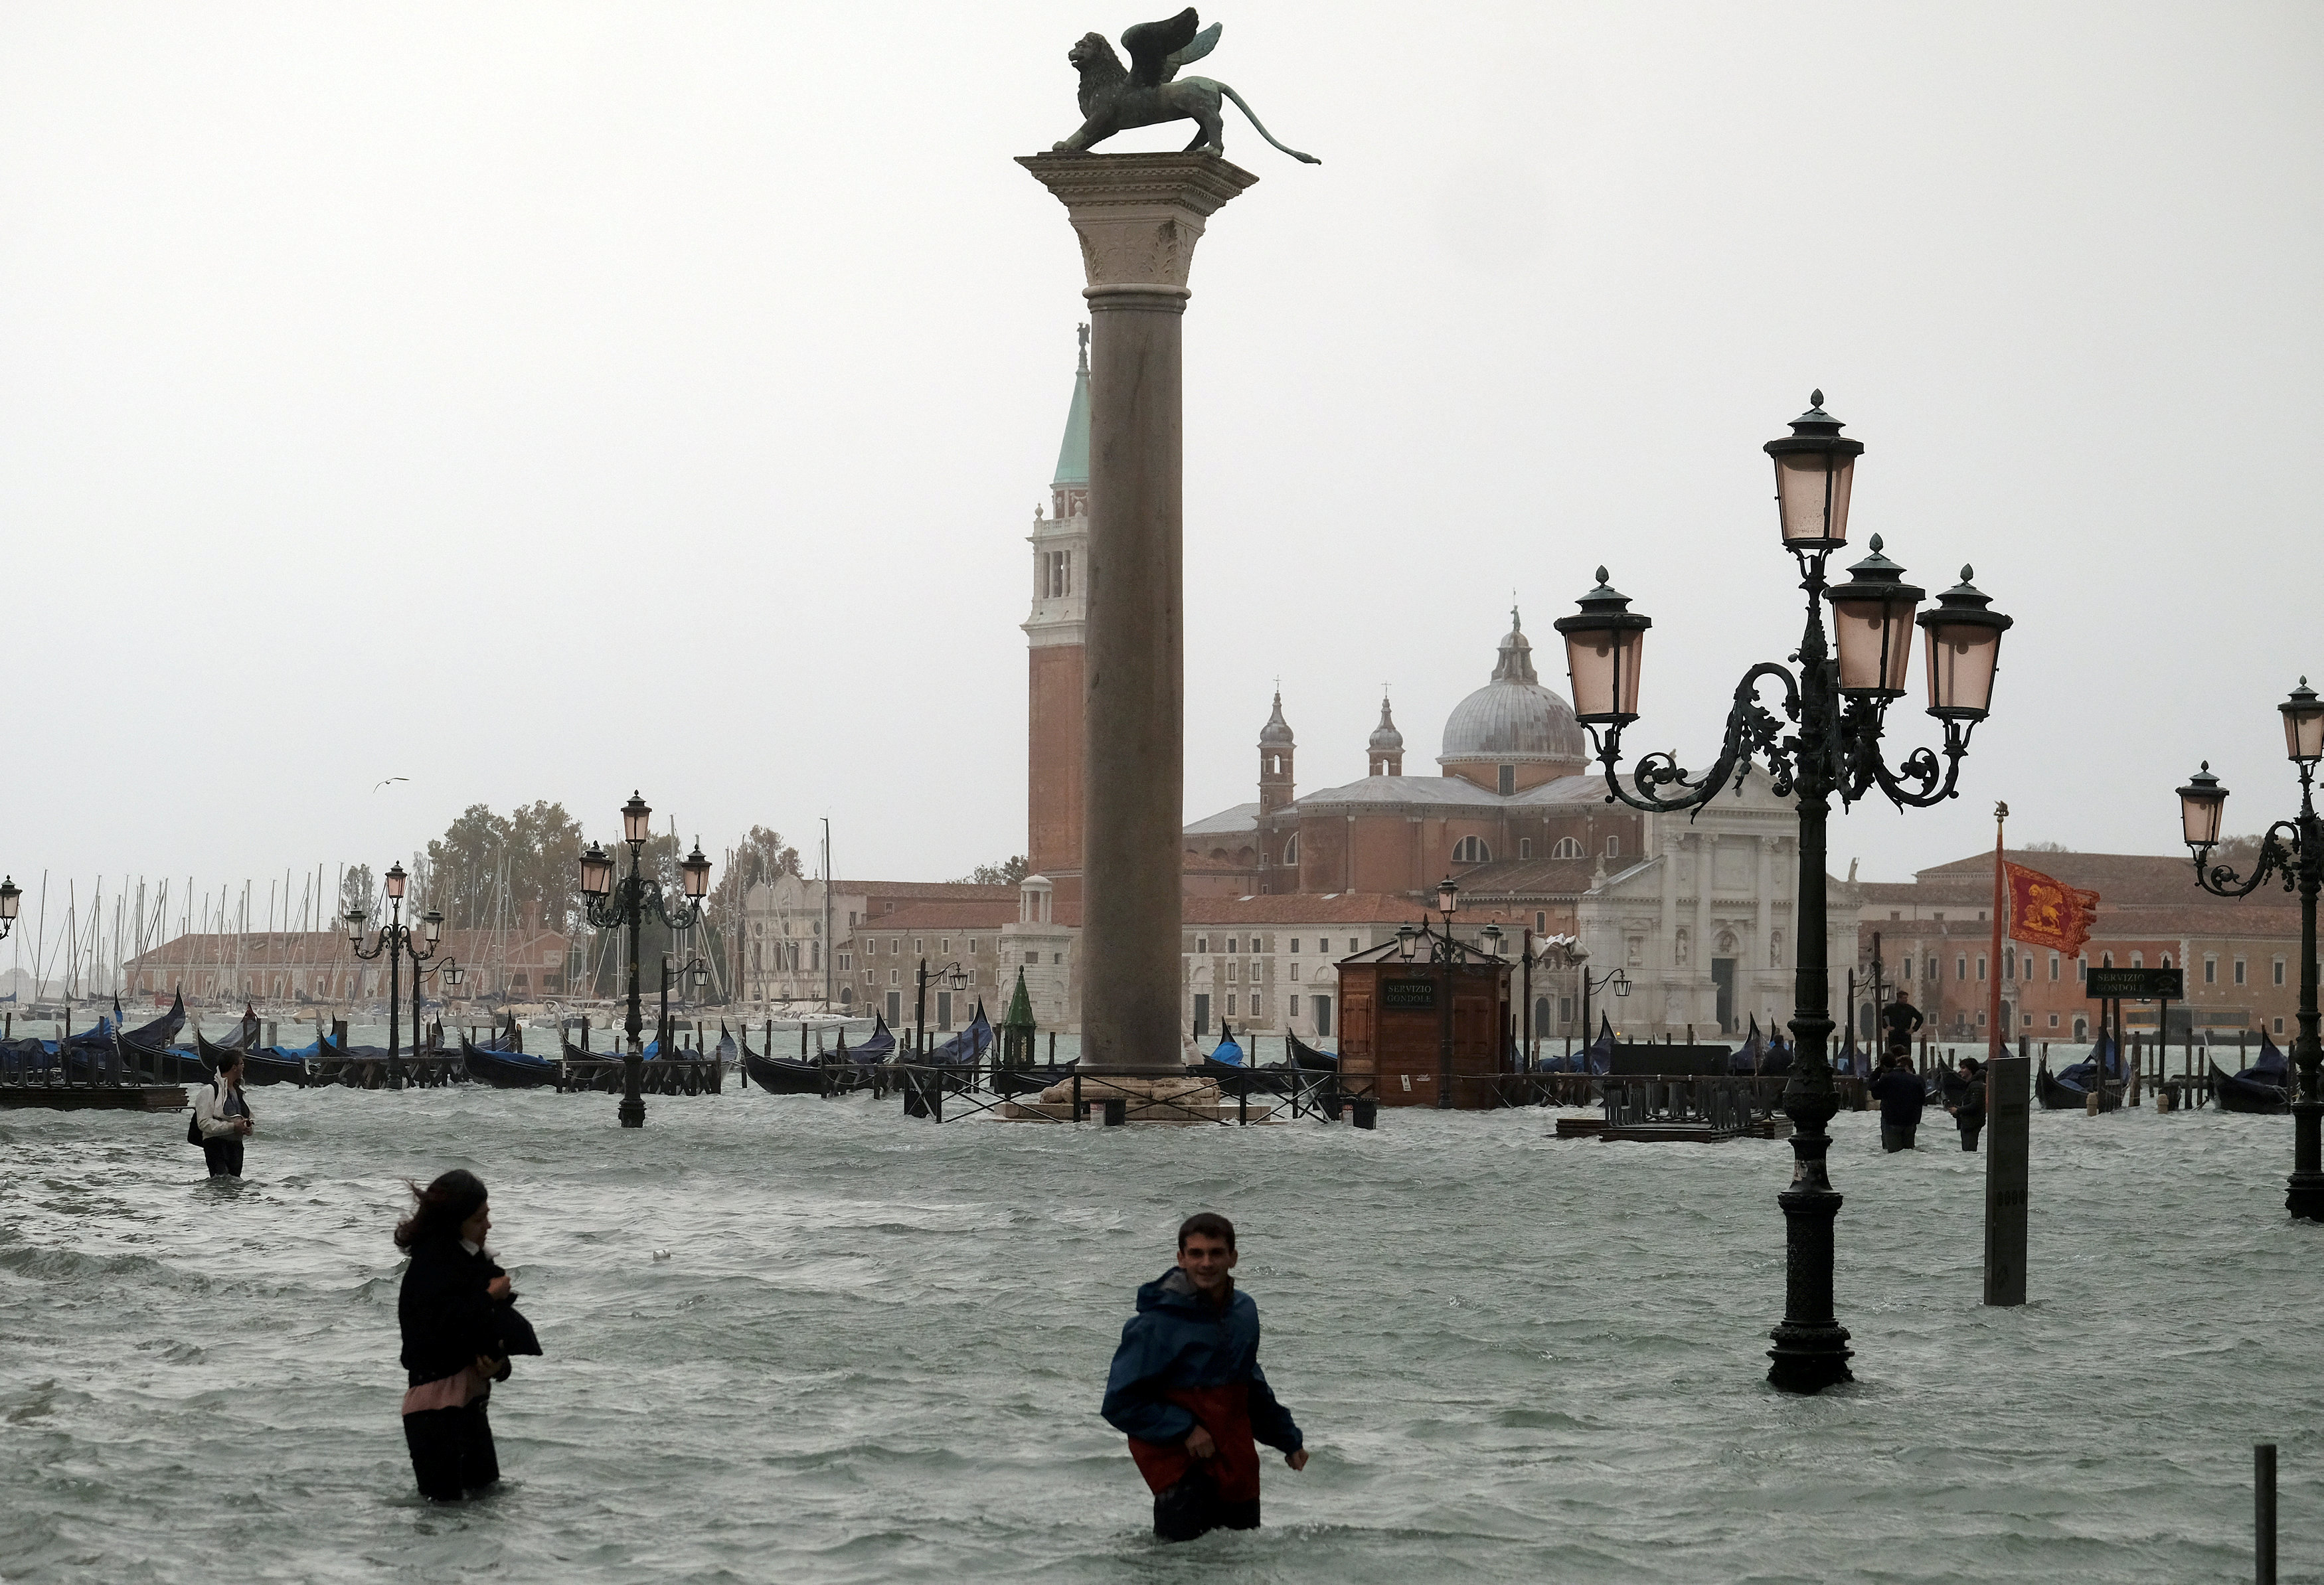 (REUTERS/Manuel Silvestri)